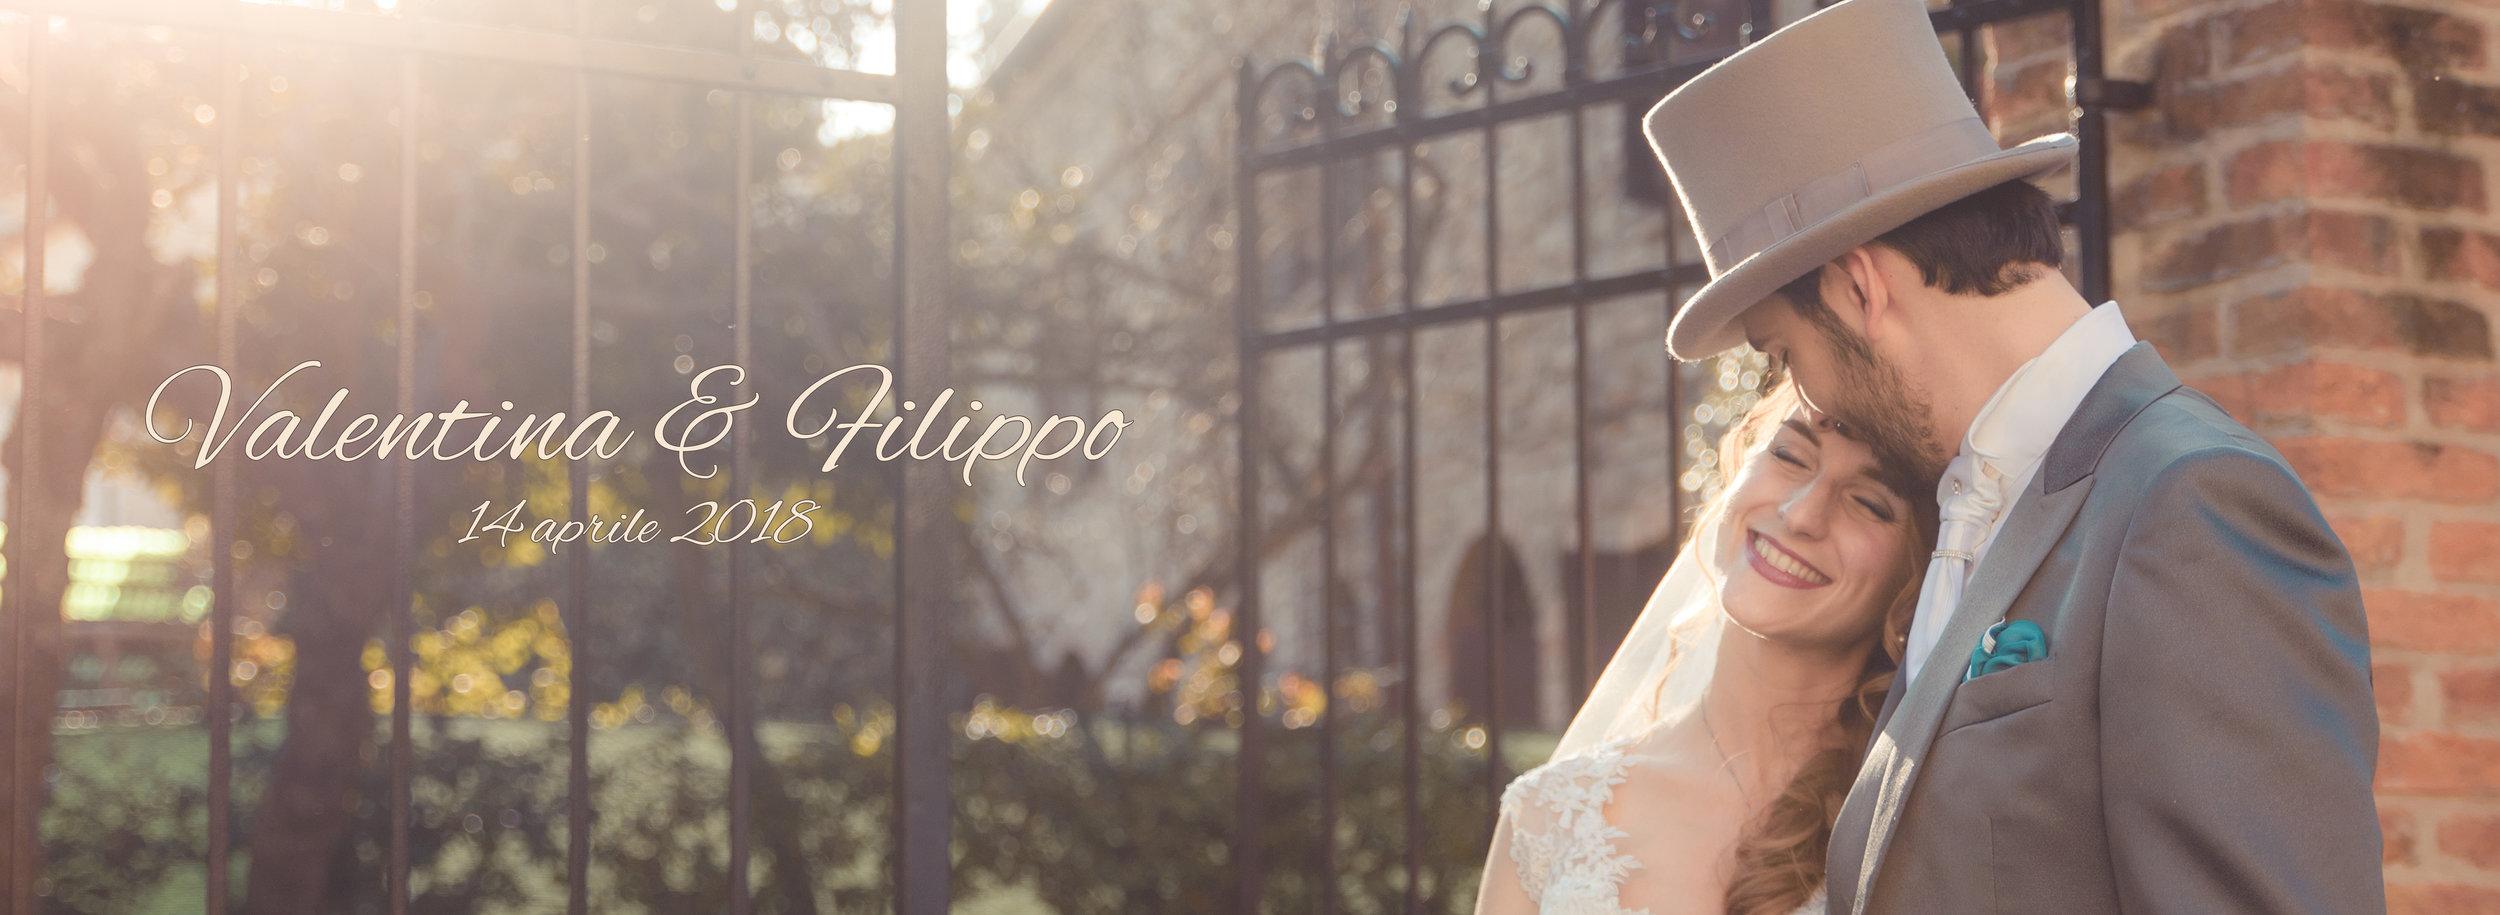 ALBUM DEFINITO valentinafilippo_01.jpg